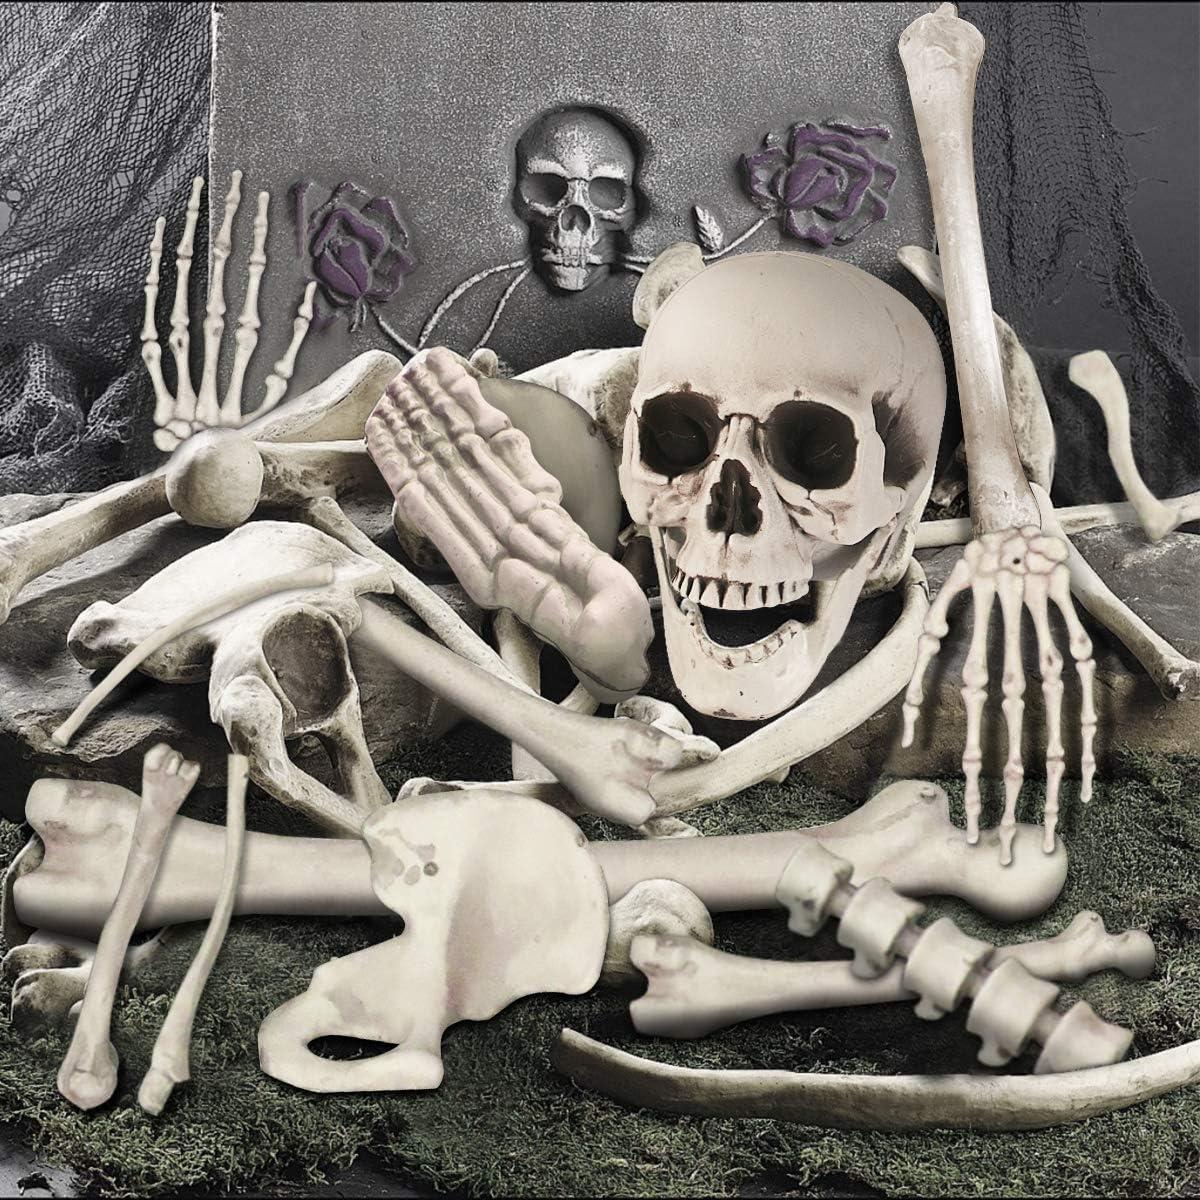 Skeleton Bones for Halloween Decoration Plastic Bones Scary Props Decoration for Life Size Skull Bones Decor for Halloween Graveyard Scene Haunted